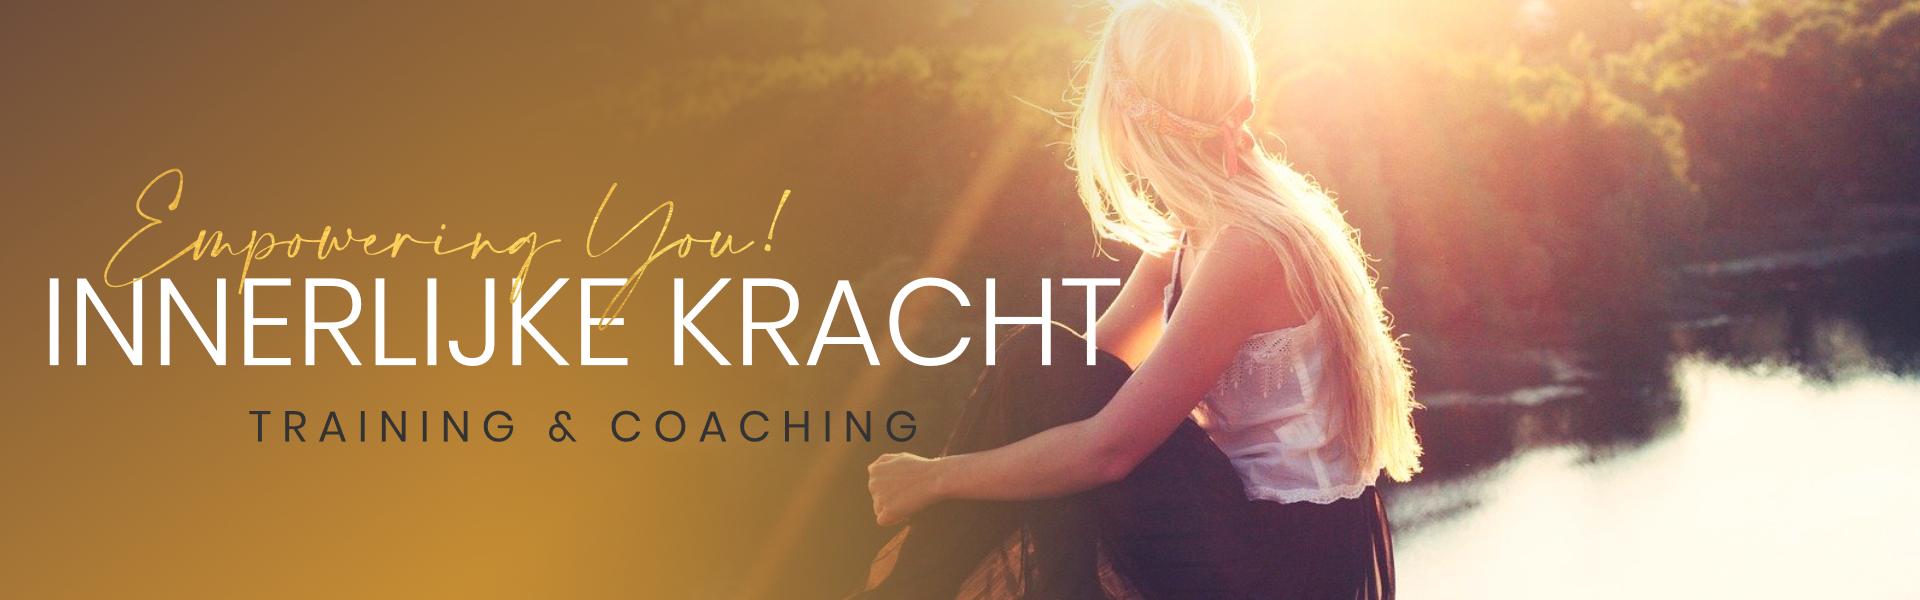 Innerlijke Kracht Training & Coaching